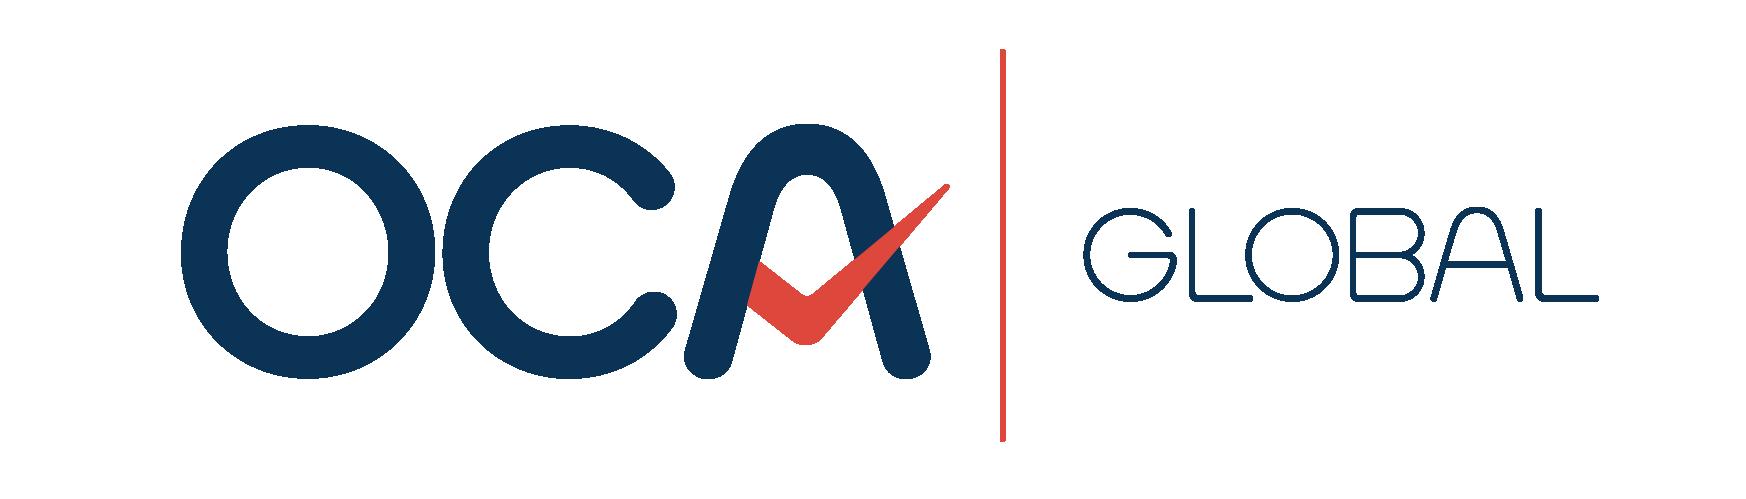 http://asocat.net/public/images/1549644186__backend_resources_logos_ocaglobal-logo-hcmyk-(7).jpg